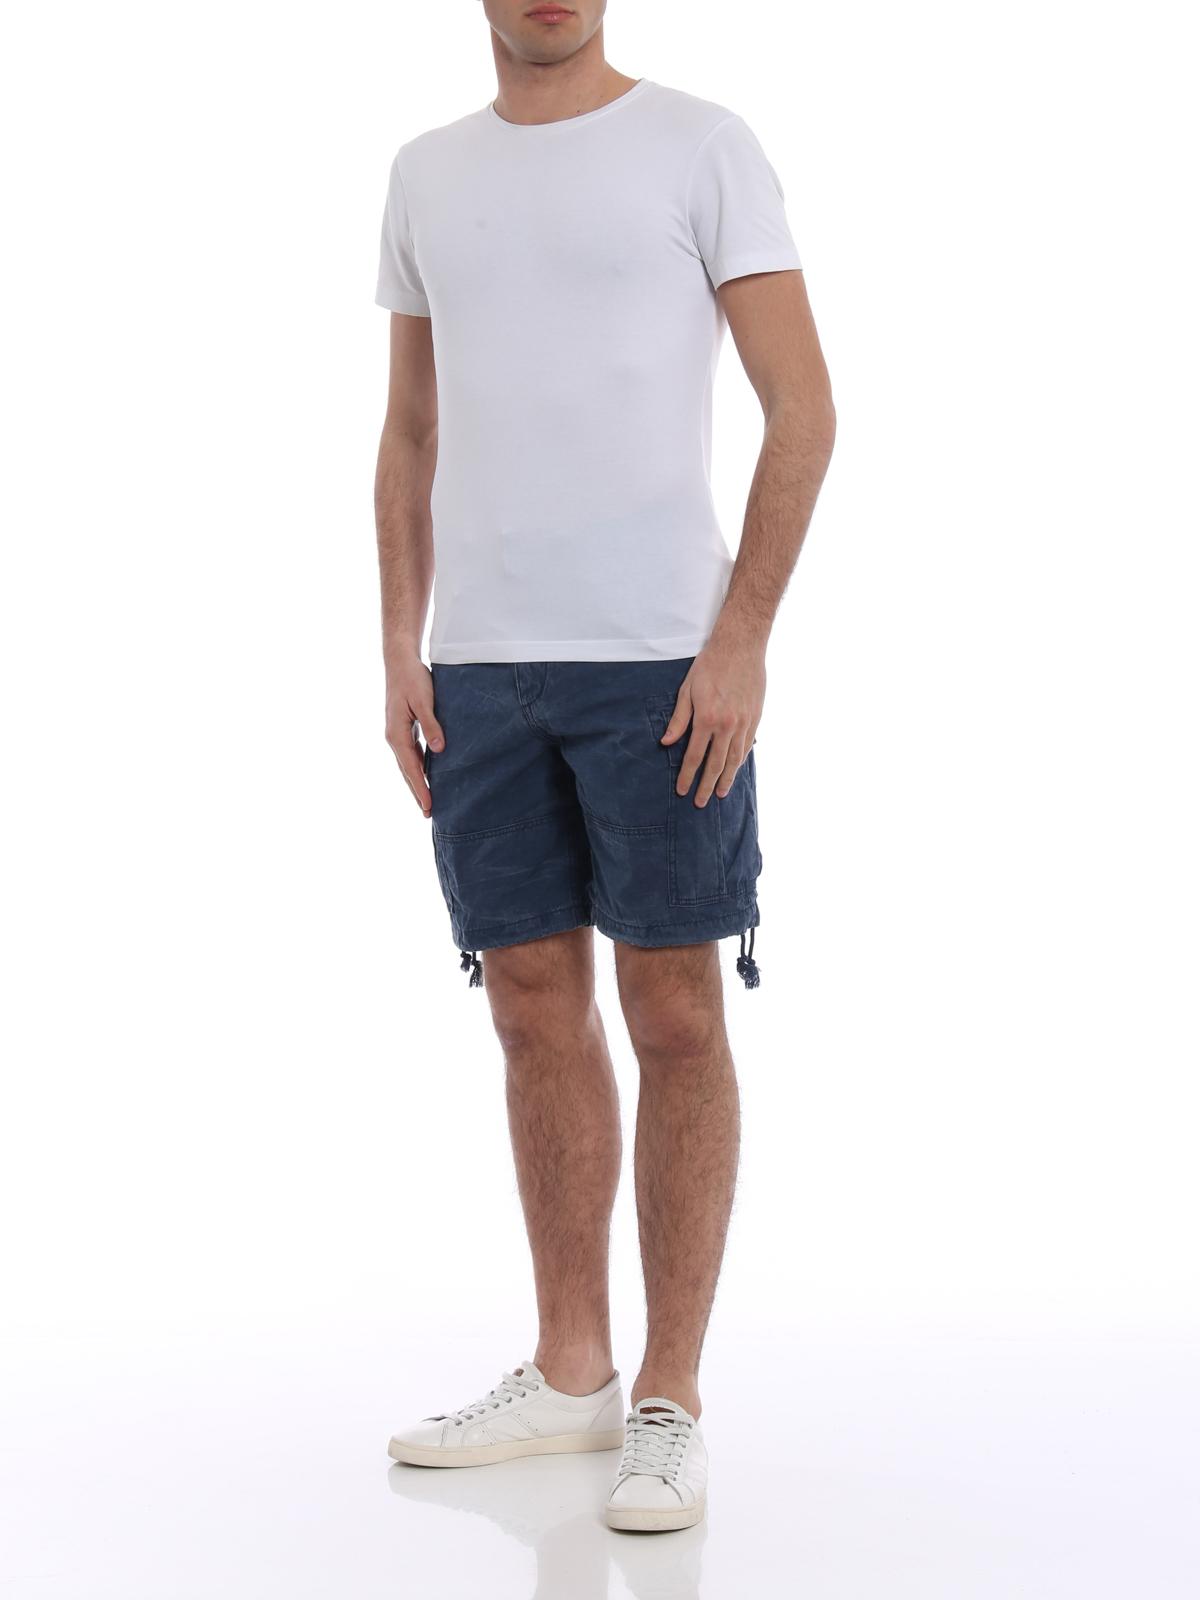 db89ca1002 POLO RALPH LAUREN: Trousers Shorts online - Classic Fit cargo short pants